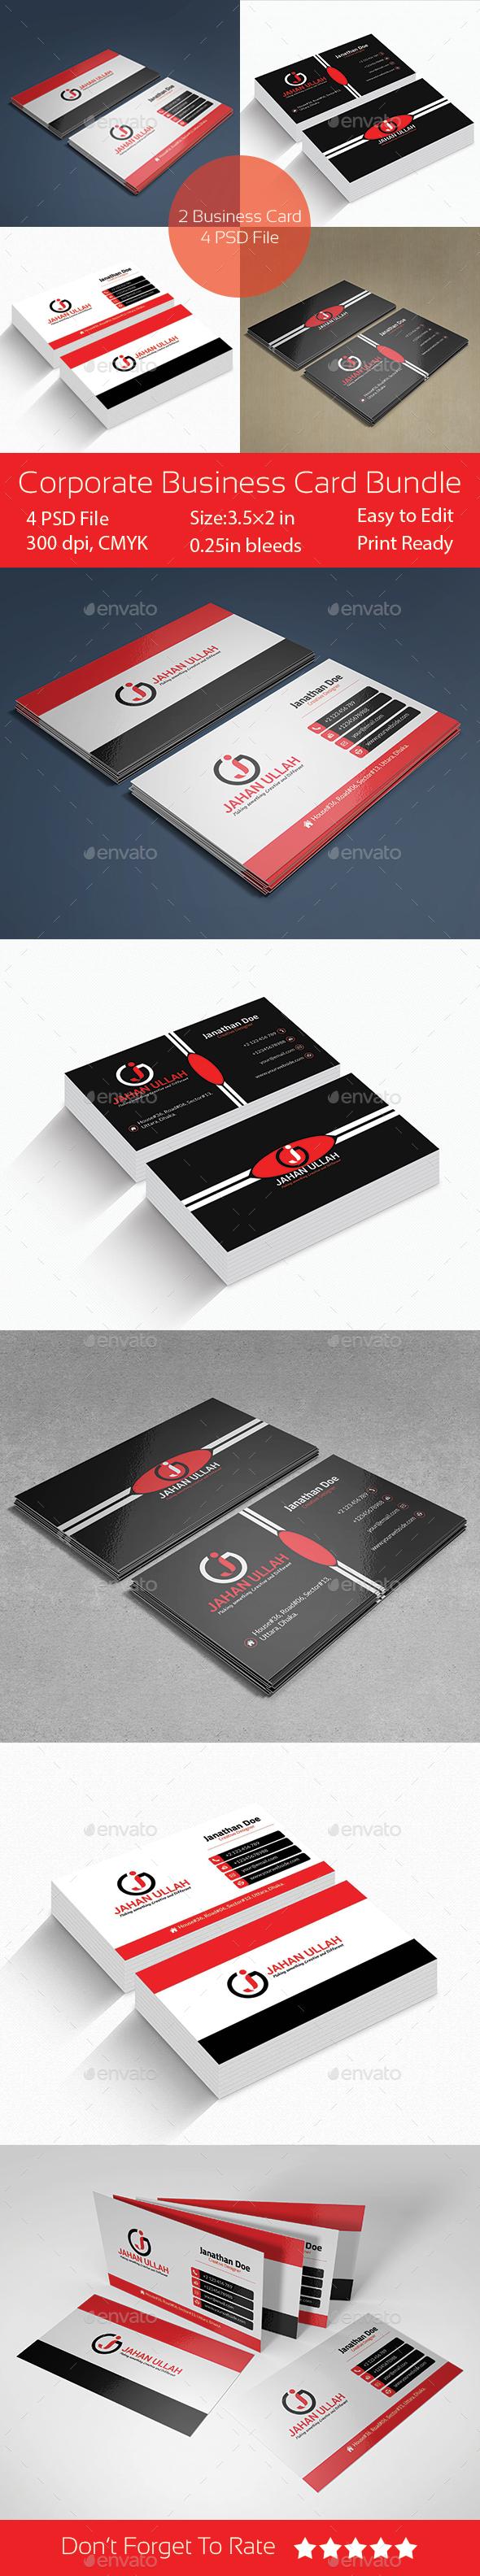 Corporate Business Cards Bundle - Corporate Business Cards